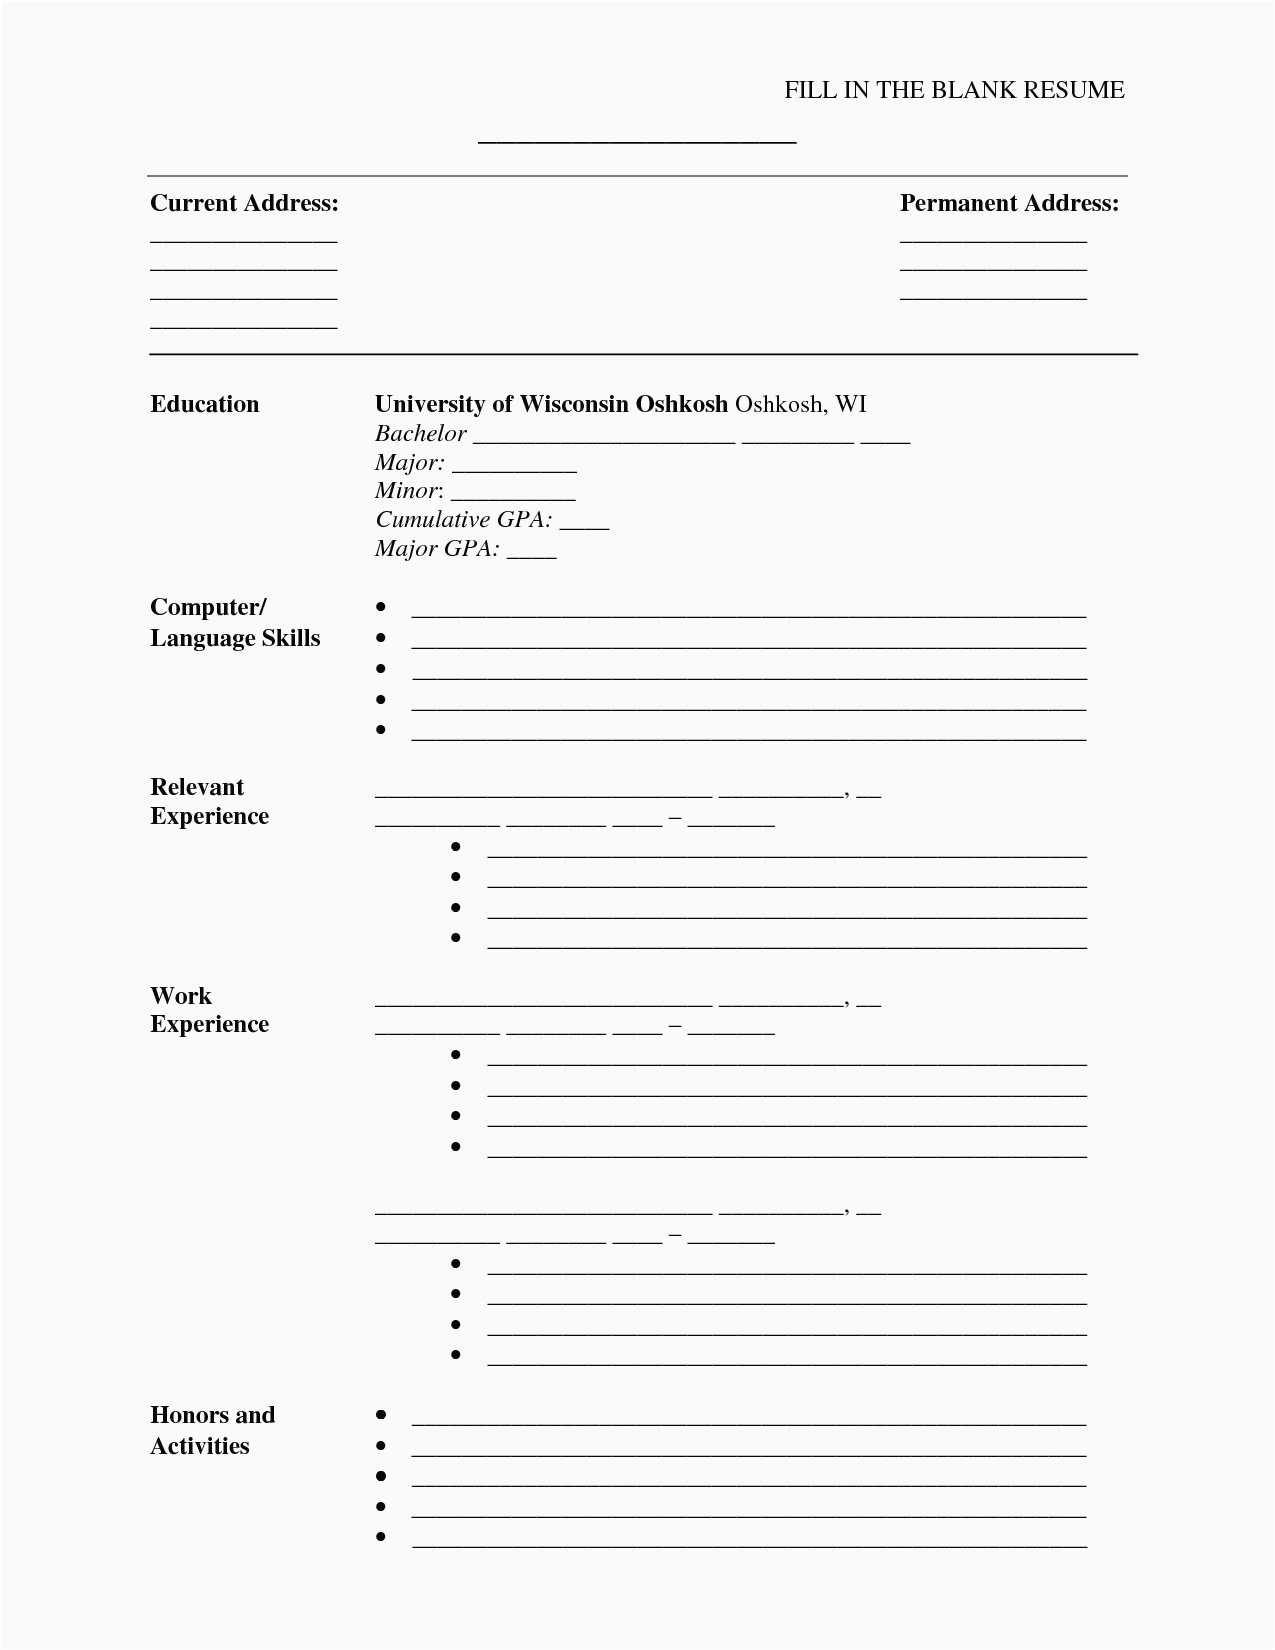 Free Printable Resume Template Inspirational 30 Free Microsoft Word - Free Printable Professional Resume Templates